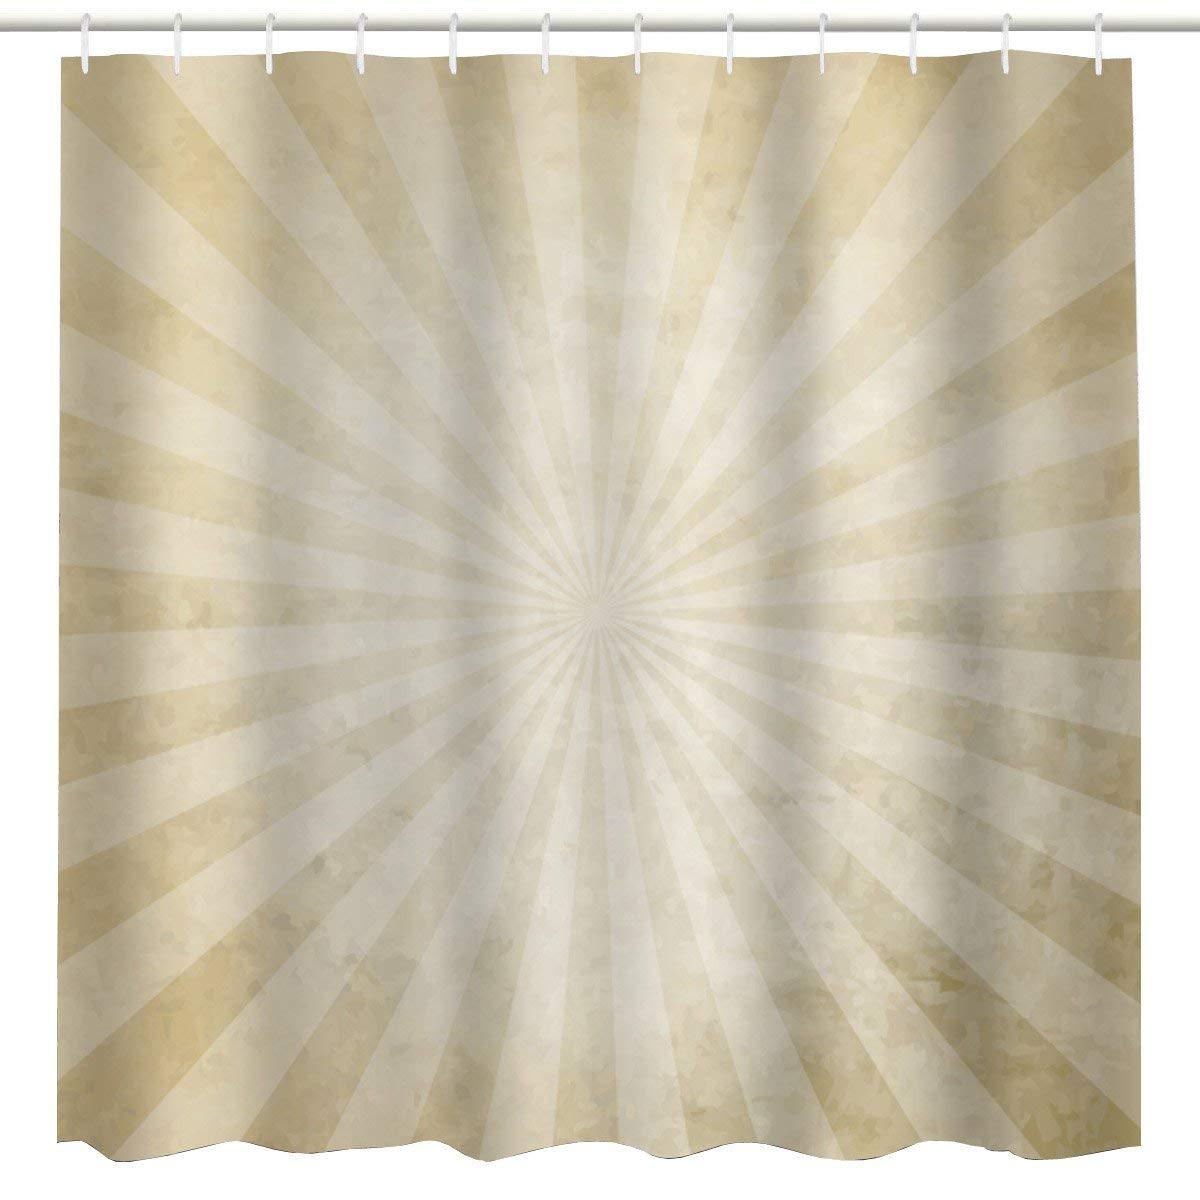 Buy Cynthia Rowley Fabric Shower Curtain Tan Light And Dark